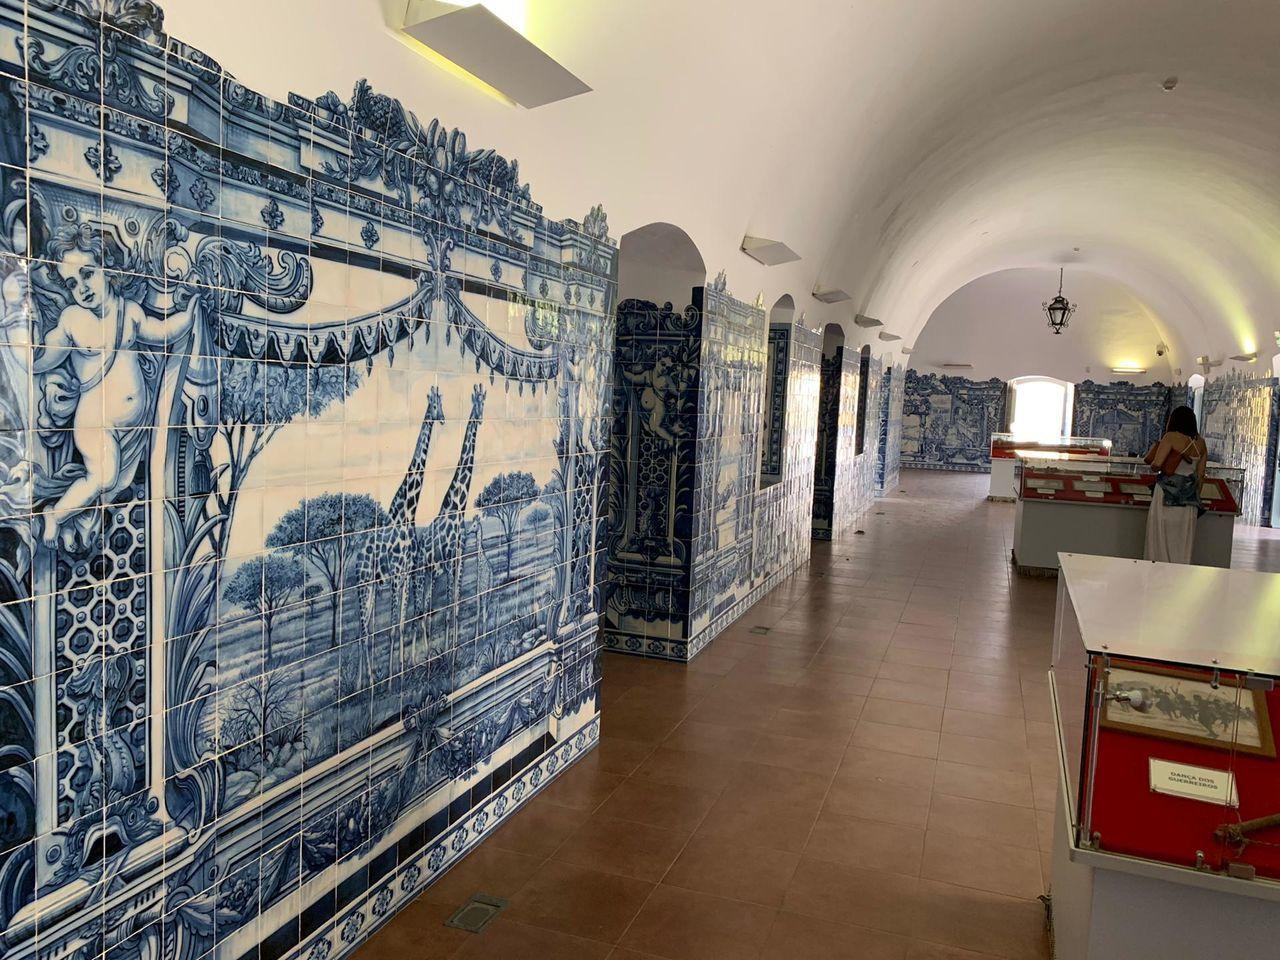 PANORAMIC VIEW OF ILLUMINATED BUILDINGS IN MUSEUM